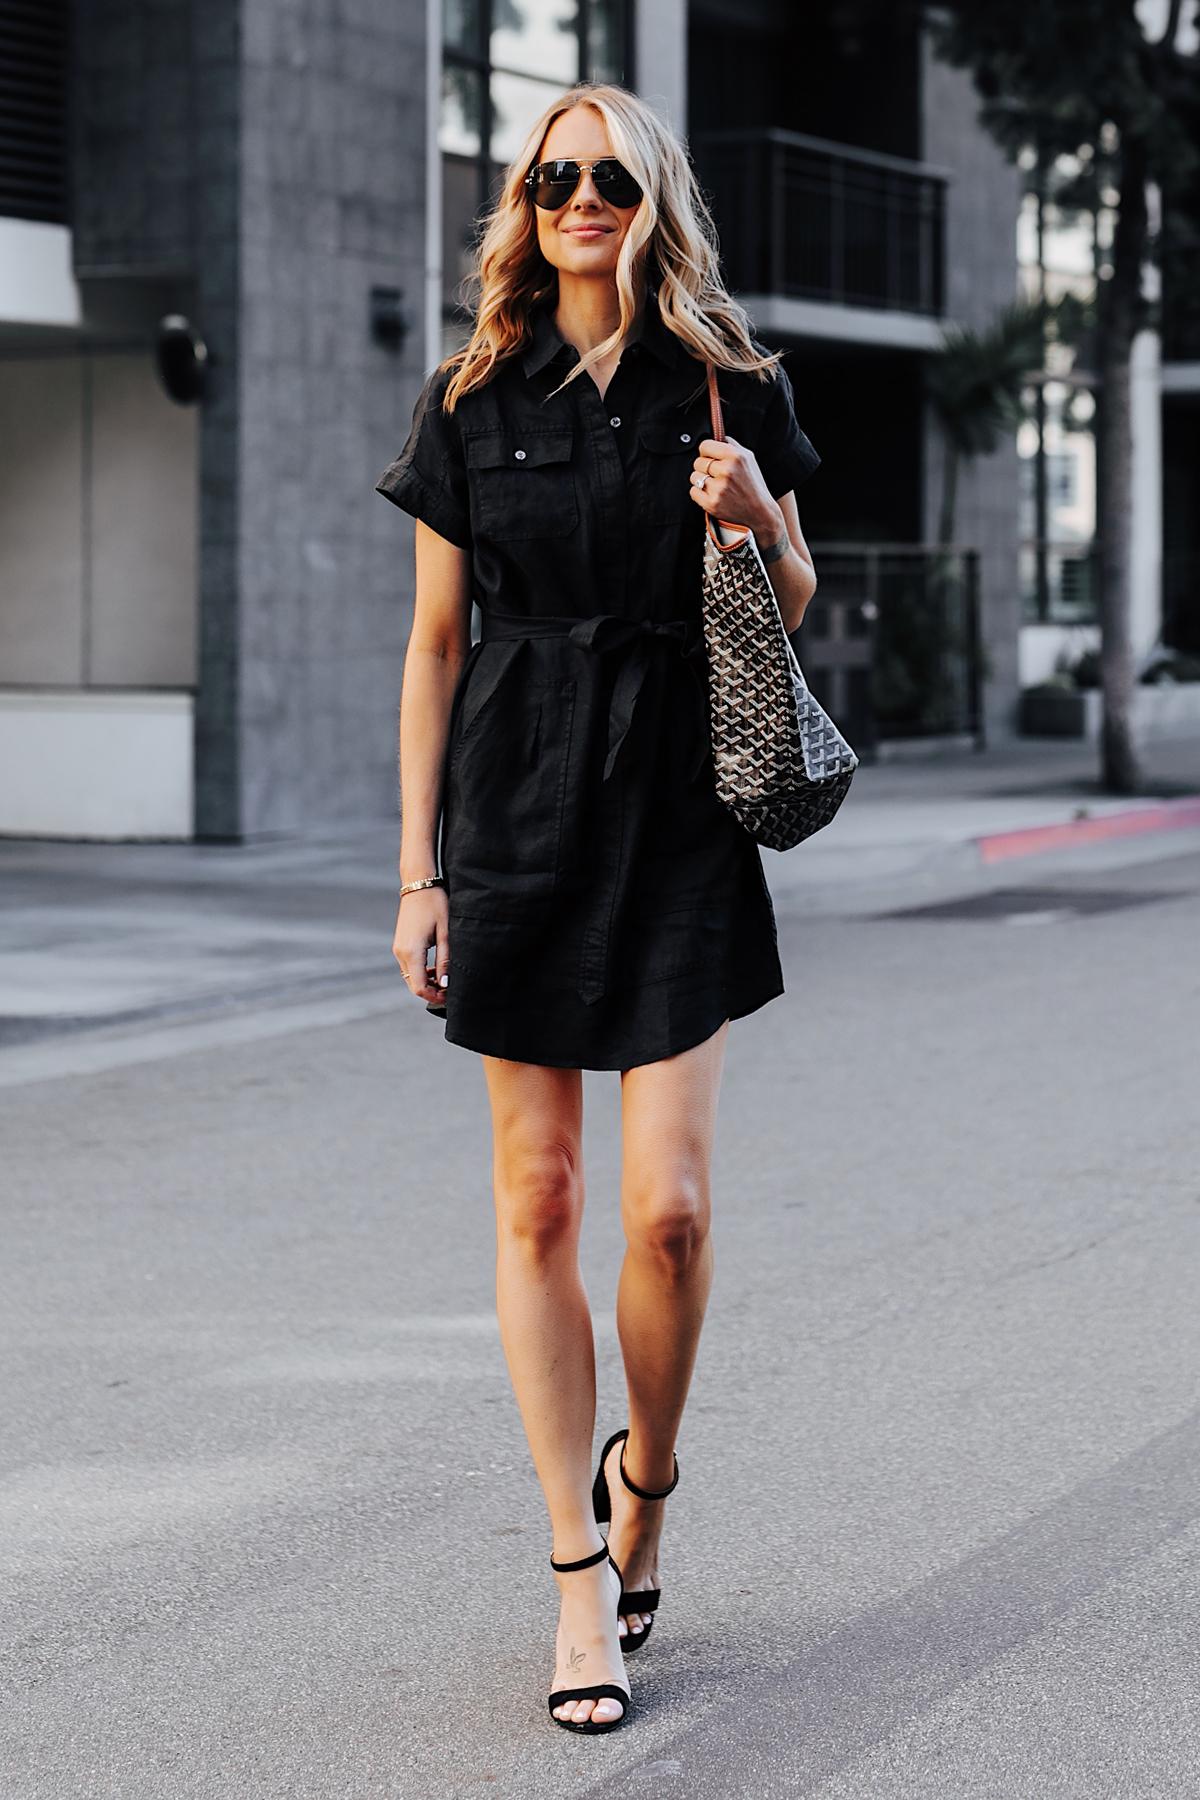 Blonde Woman Wearing Black Short Sleeve Shirt Dress Black Heeled Sandals Goyard Tote Fashion Jackson San Diego Fashion Blogger Street Style